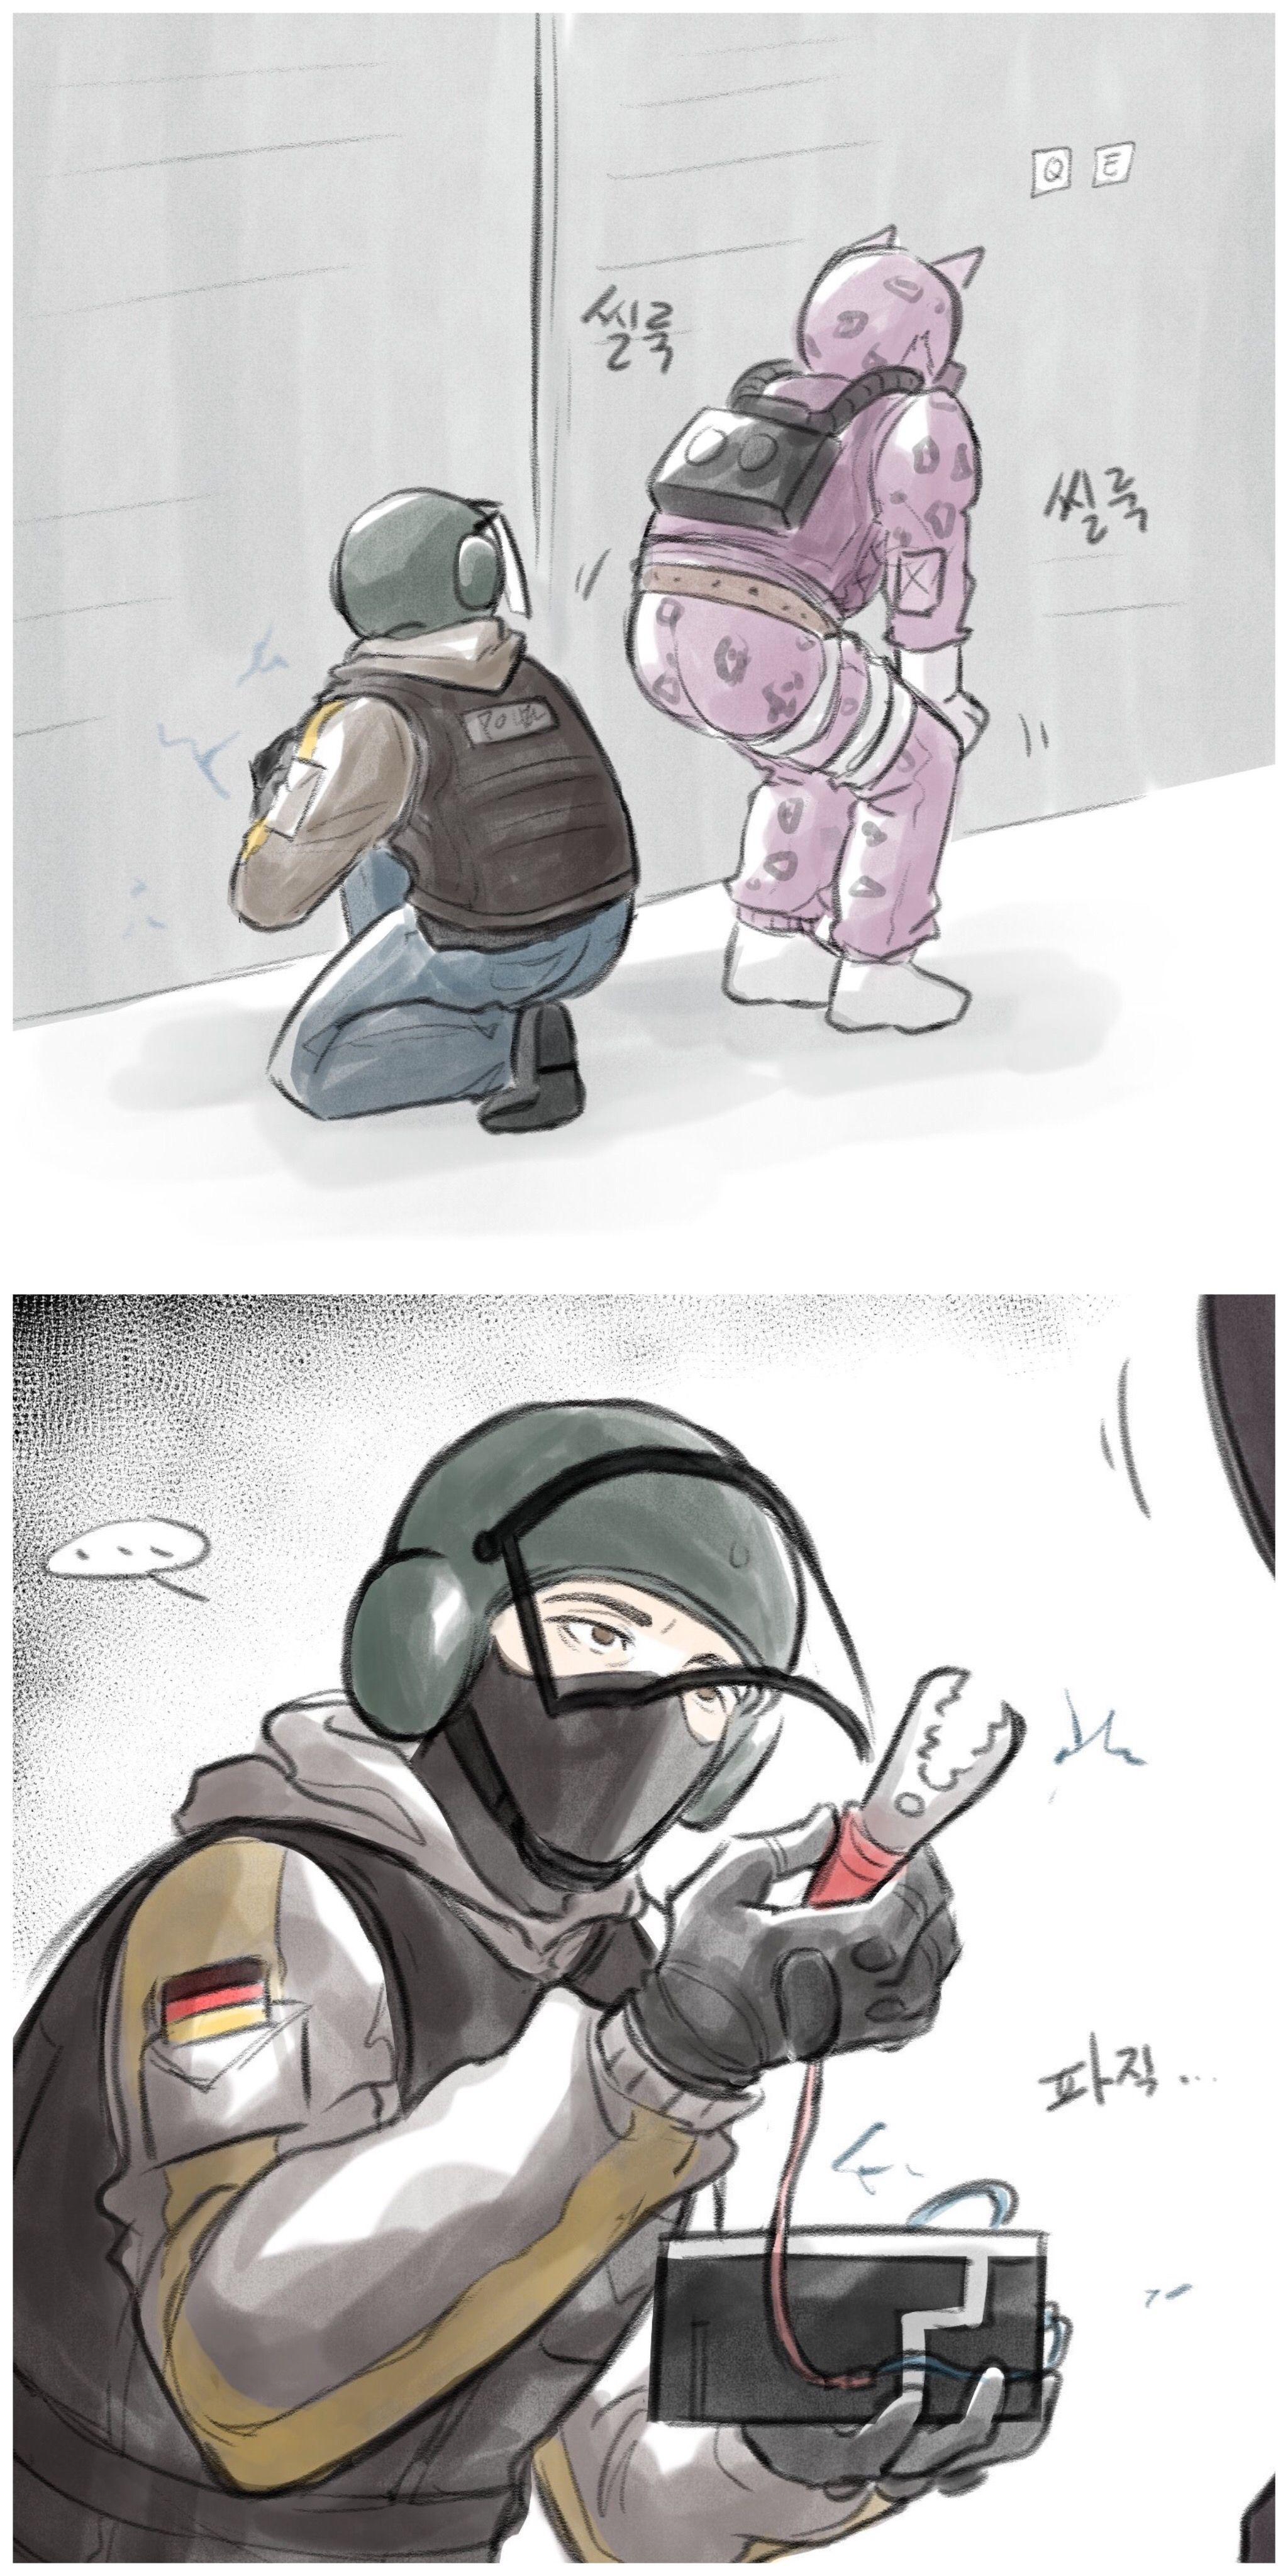 I Have The Best Copypasta Rainbow Six Siege Memes Rainbow Six Siege Anime Rainbow Six Siege Art